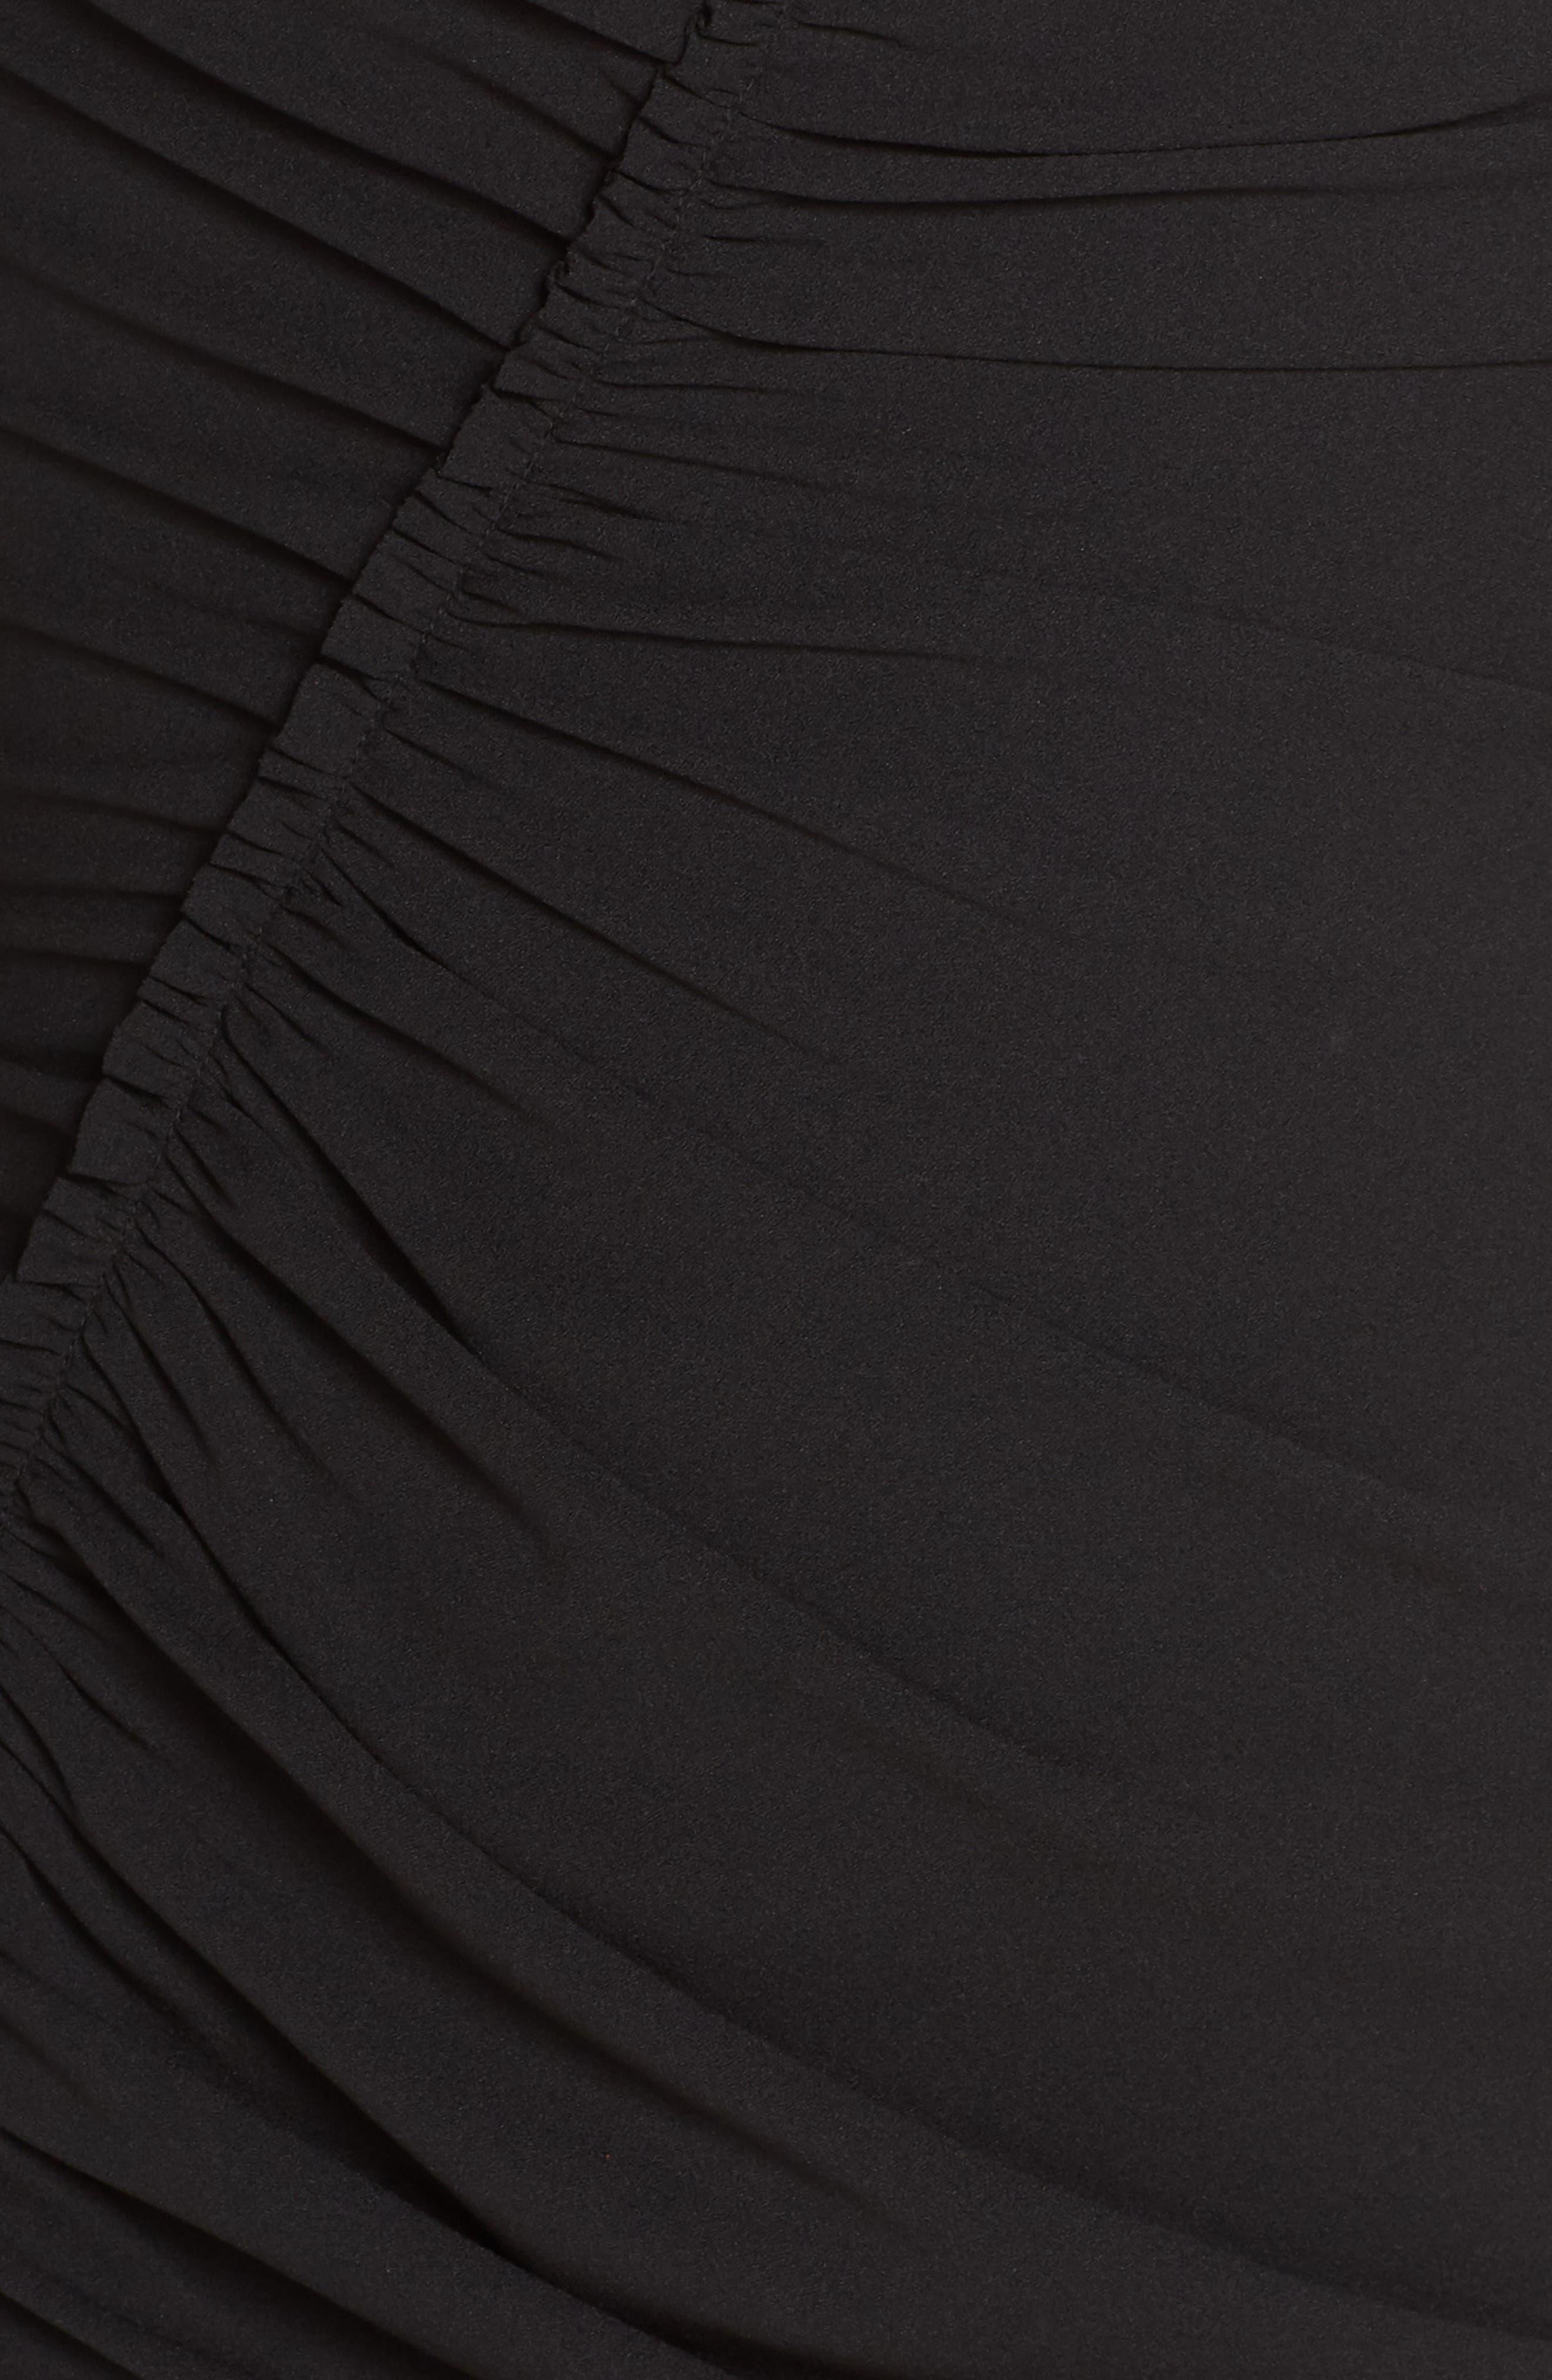 Off the Shoulder Ruched Cocktail Sheath,                             Alternate thumbnail 6, color,                             BLACK